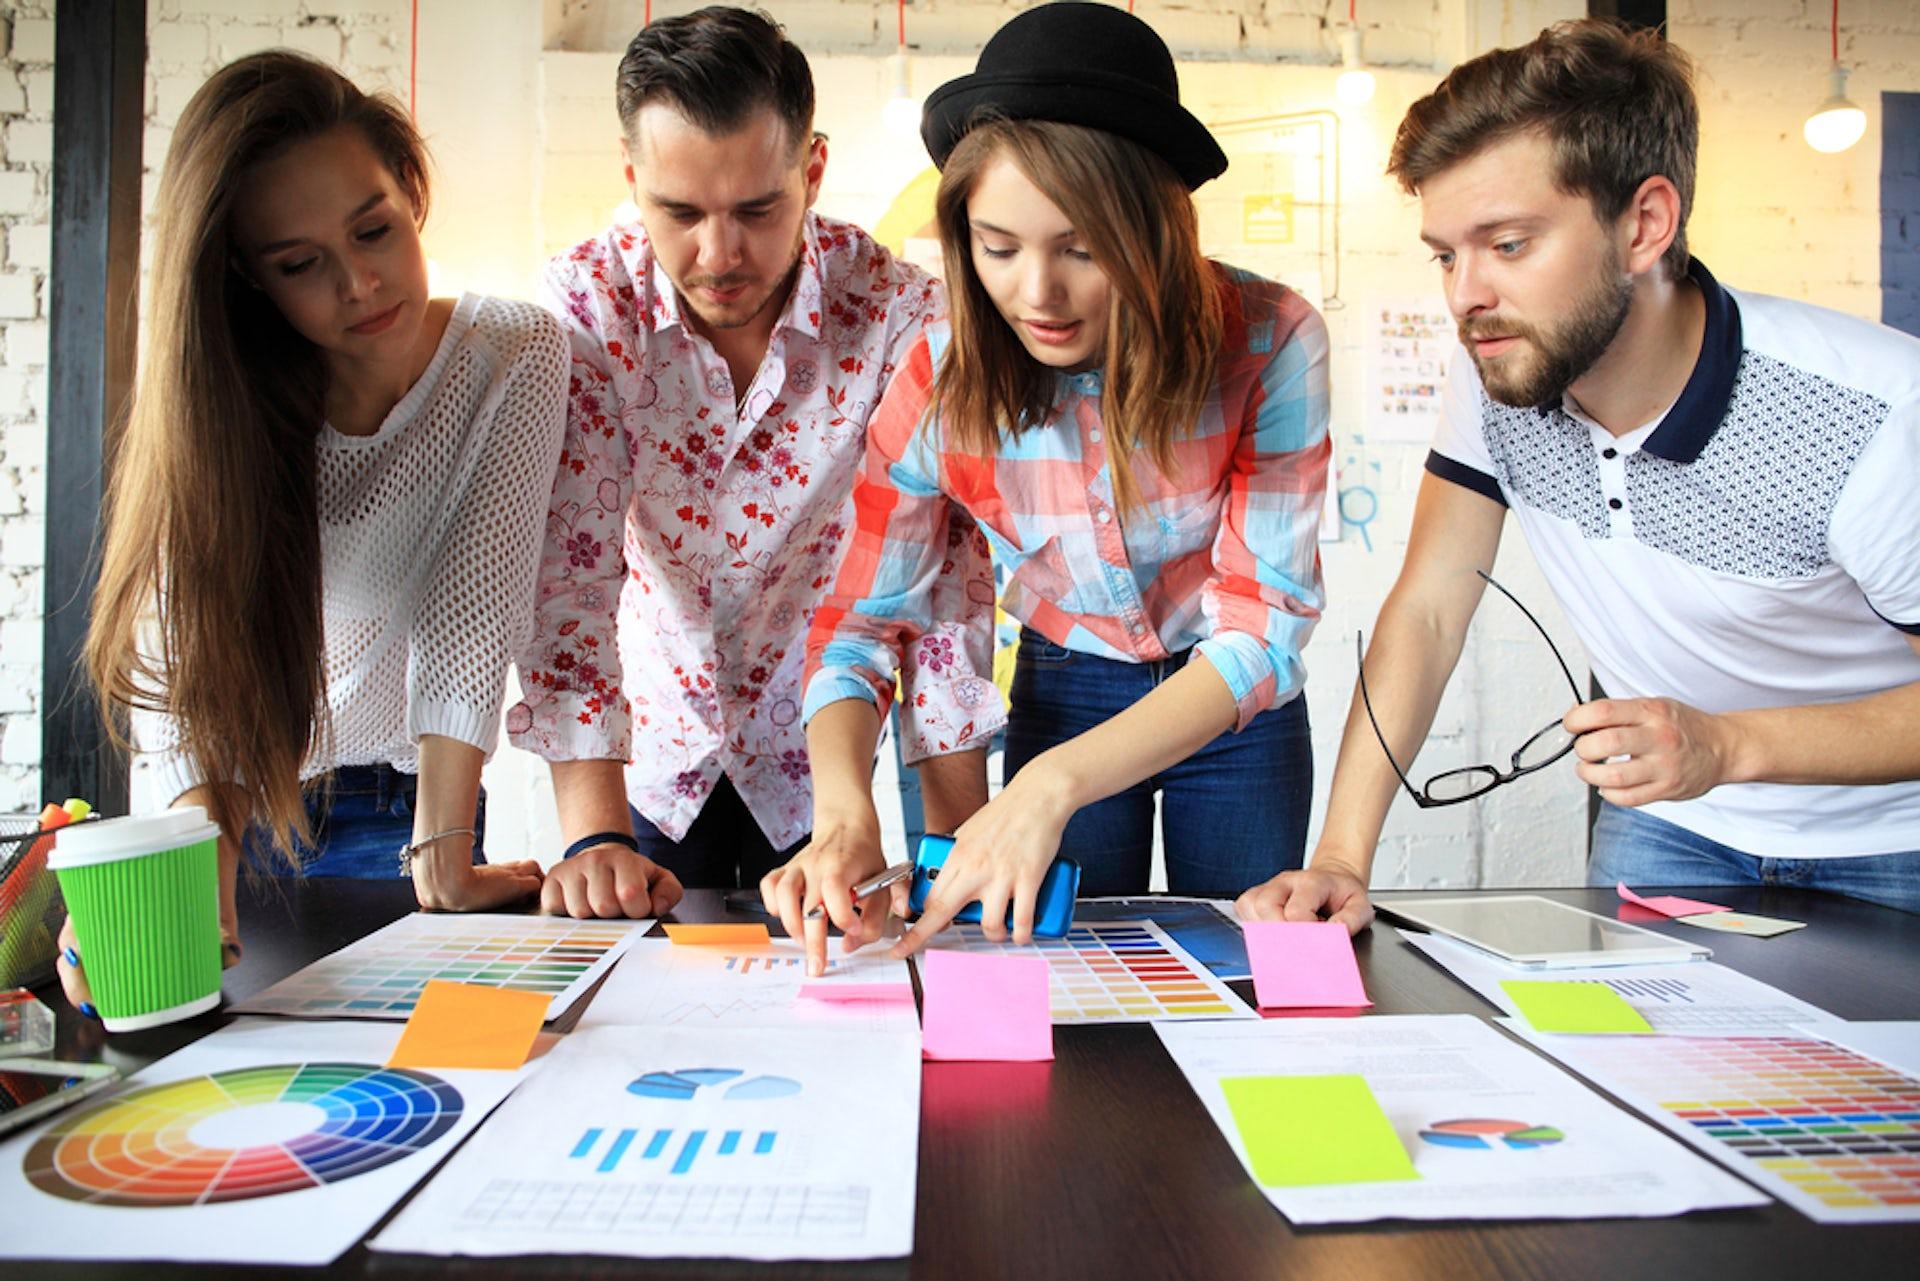 Comment valorise-t-on les start-up ?